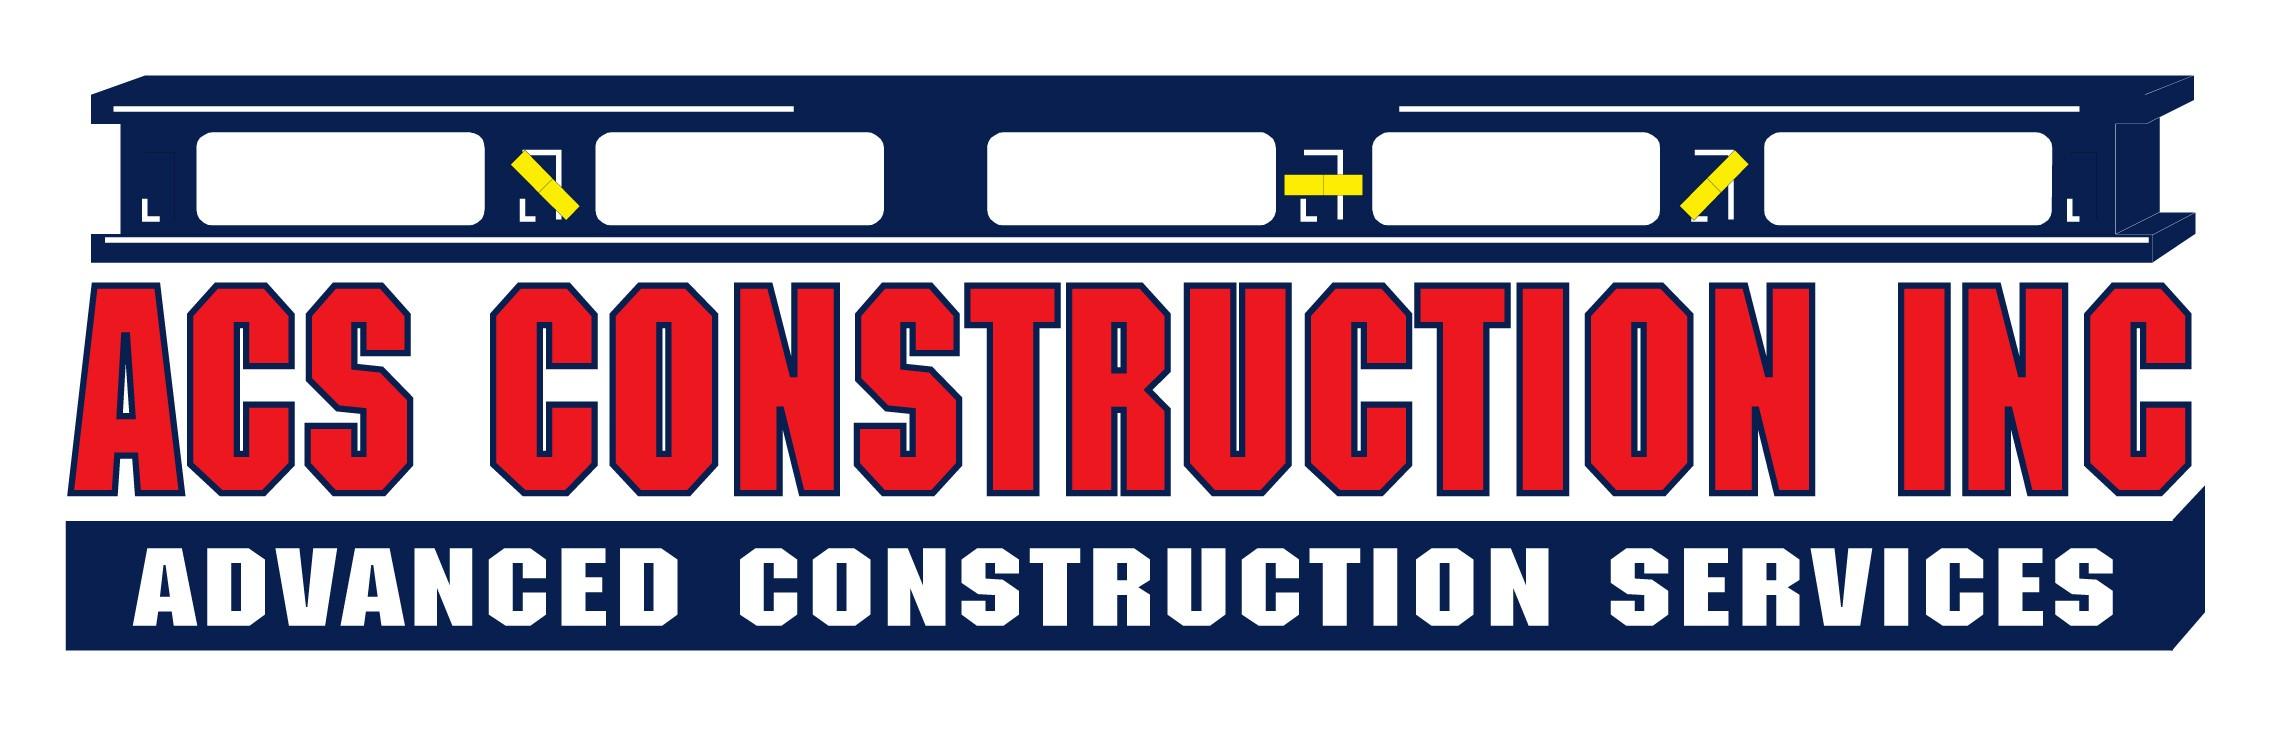 ACS Construction Inc.